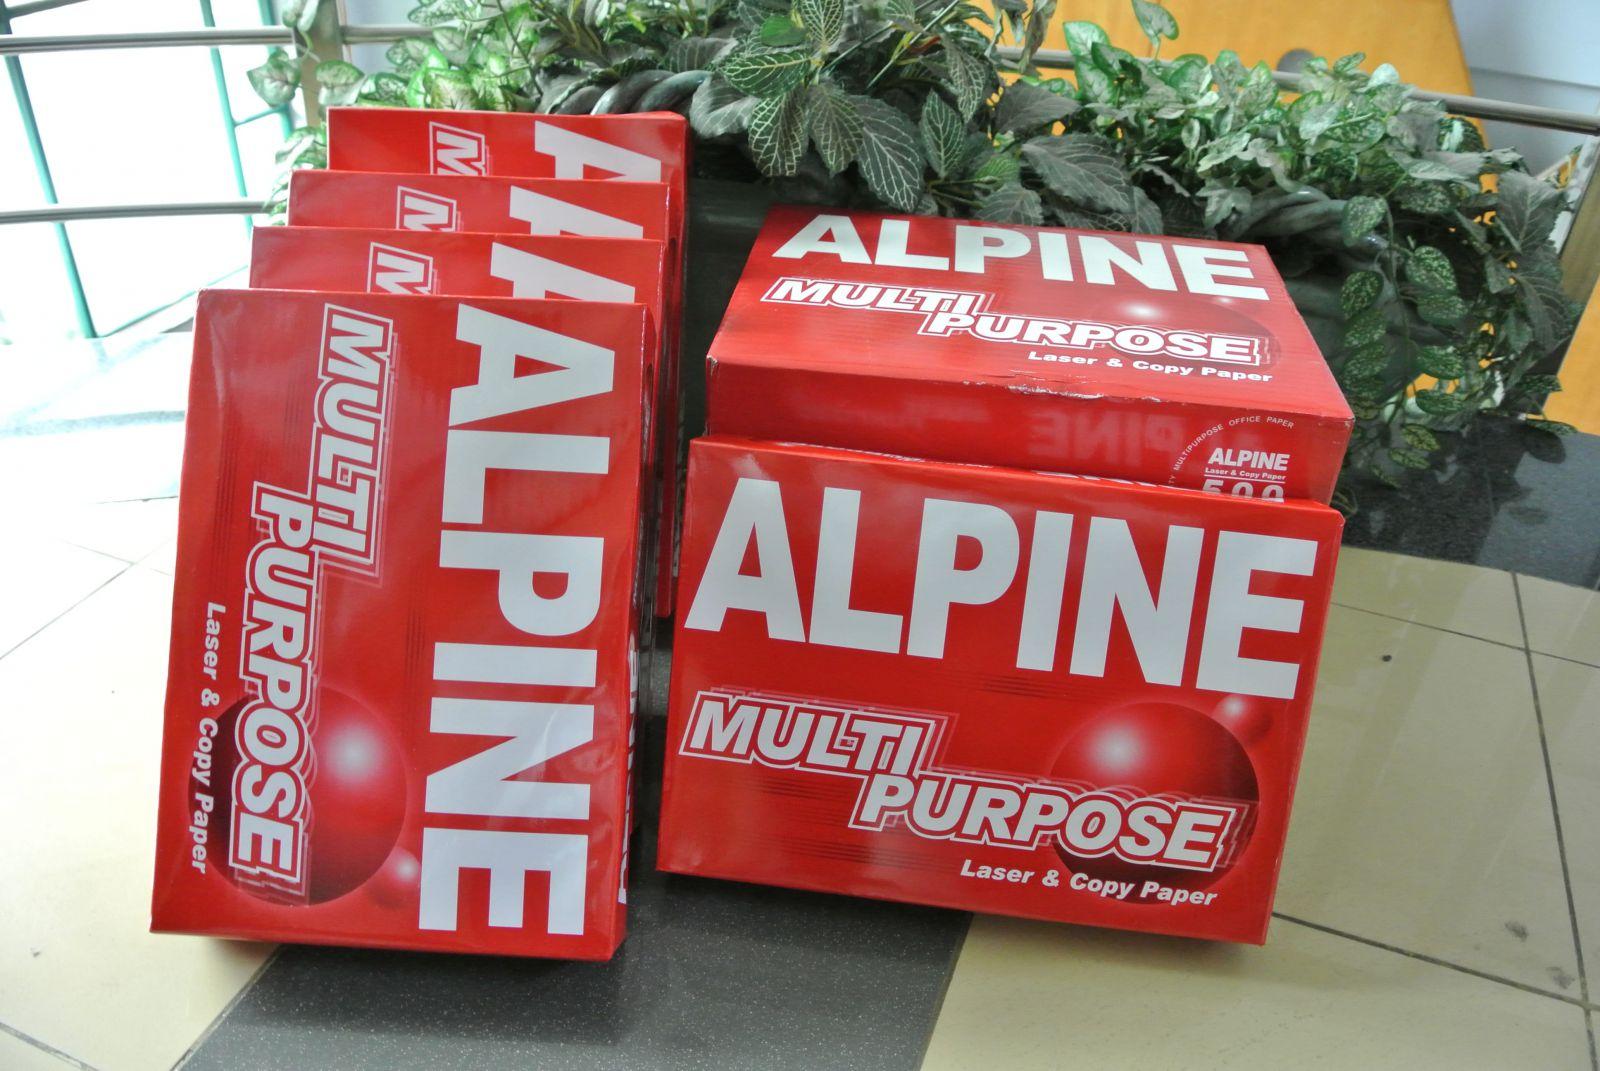 ALPINE 70 (A4)